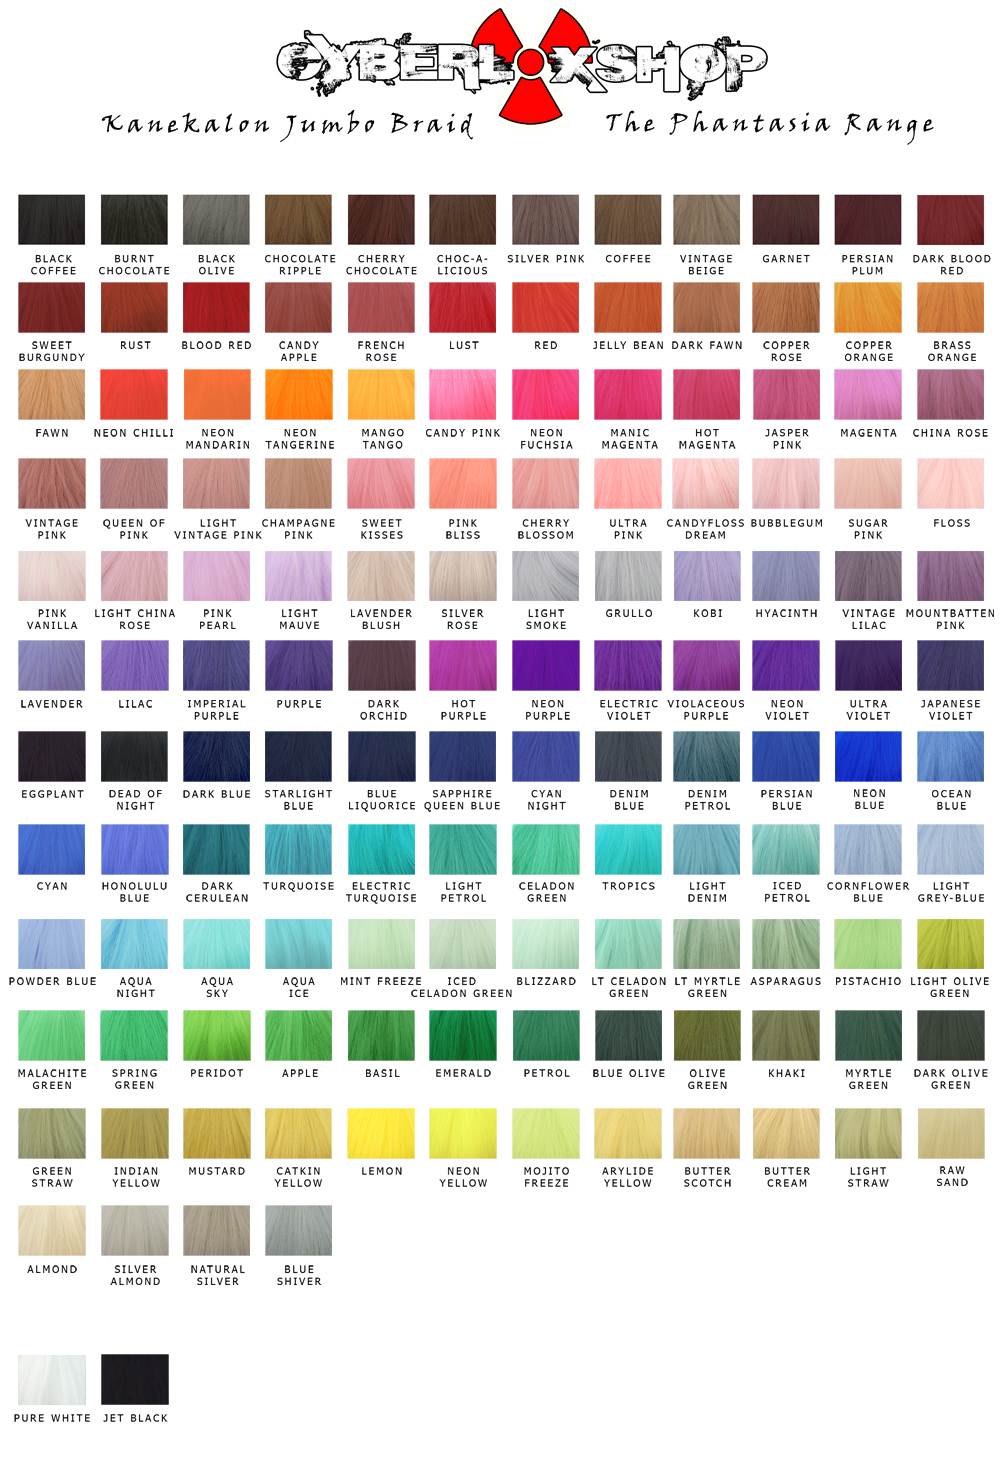 Cyberloxshop phantasia kanekalon jumbo braid cyberloxshop the phantasia kanekalon jumbo braid colour chart nvjuhfo Image collections